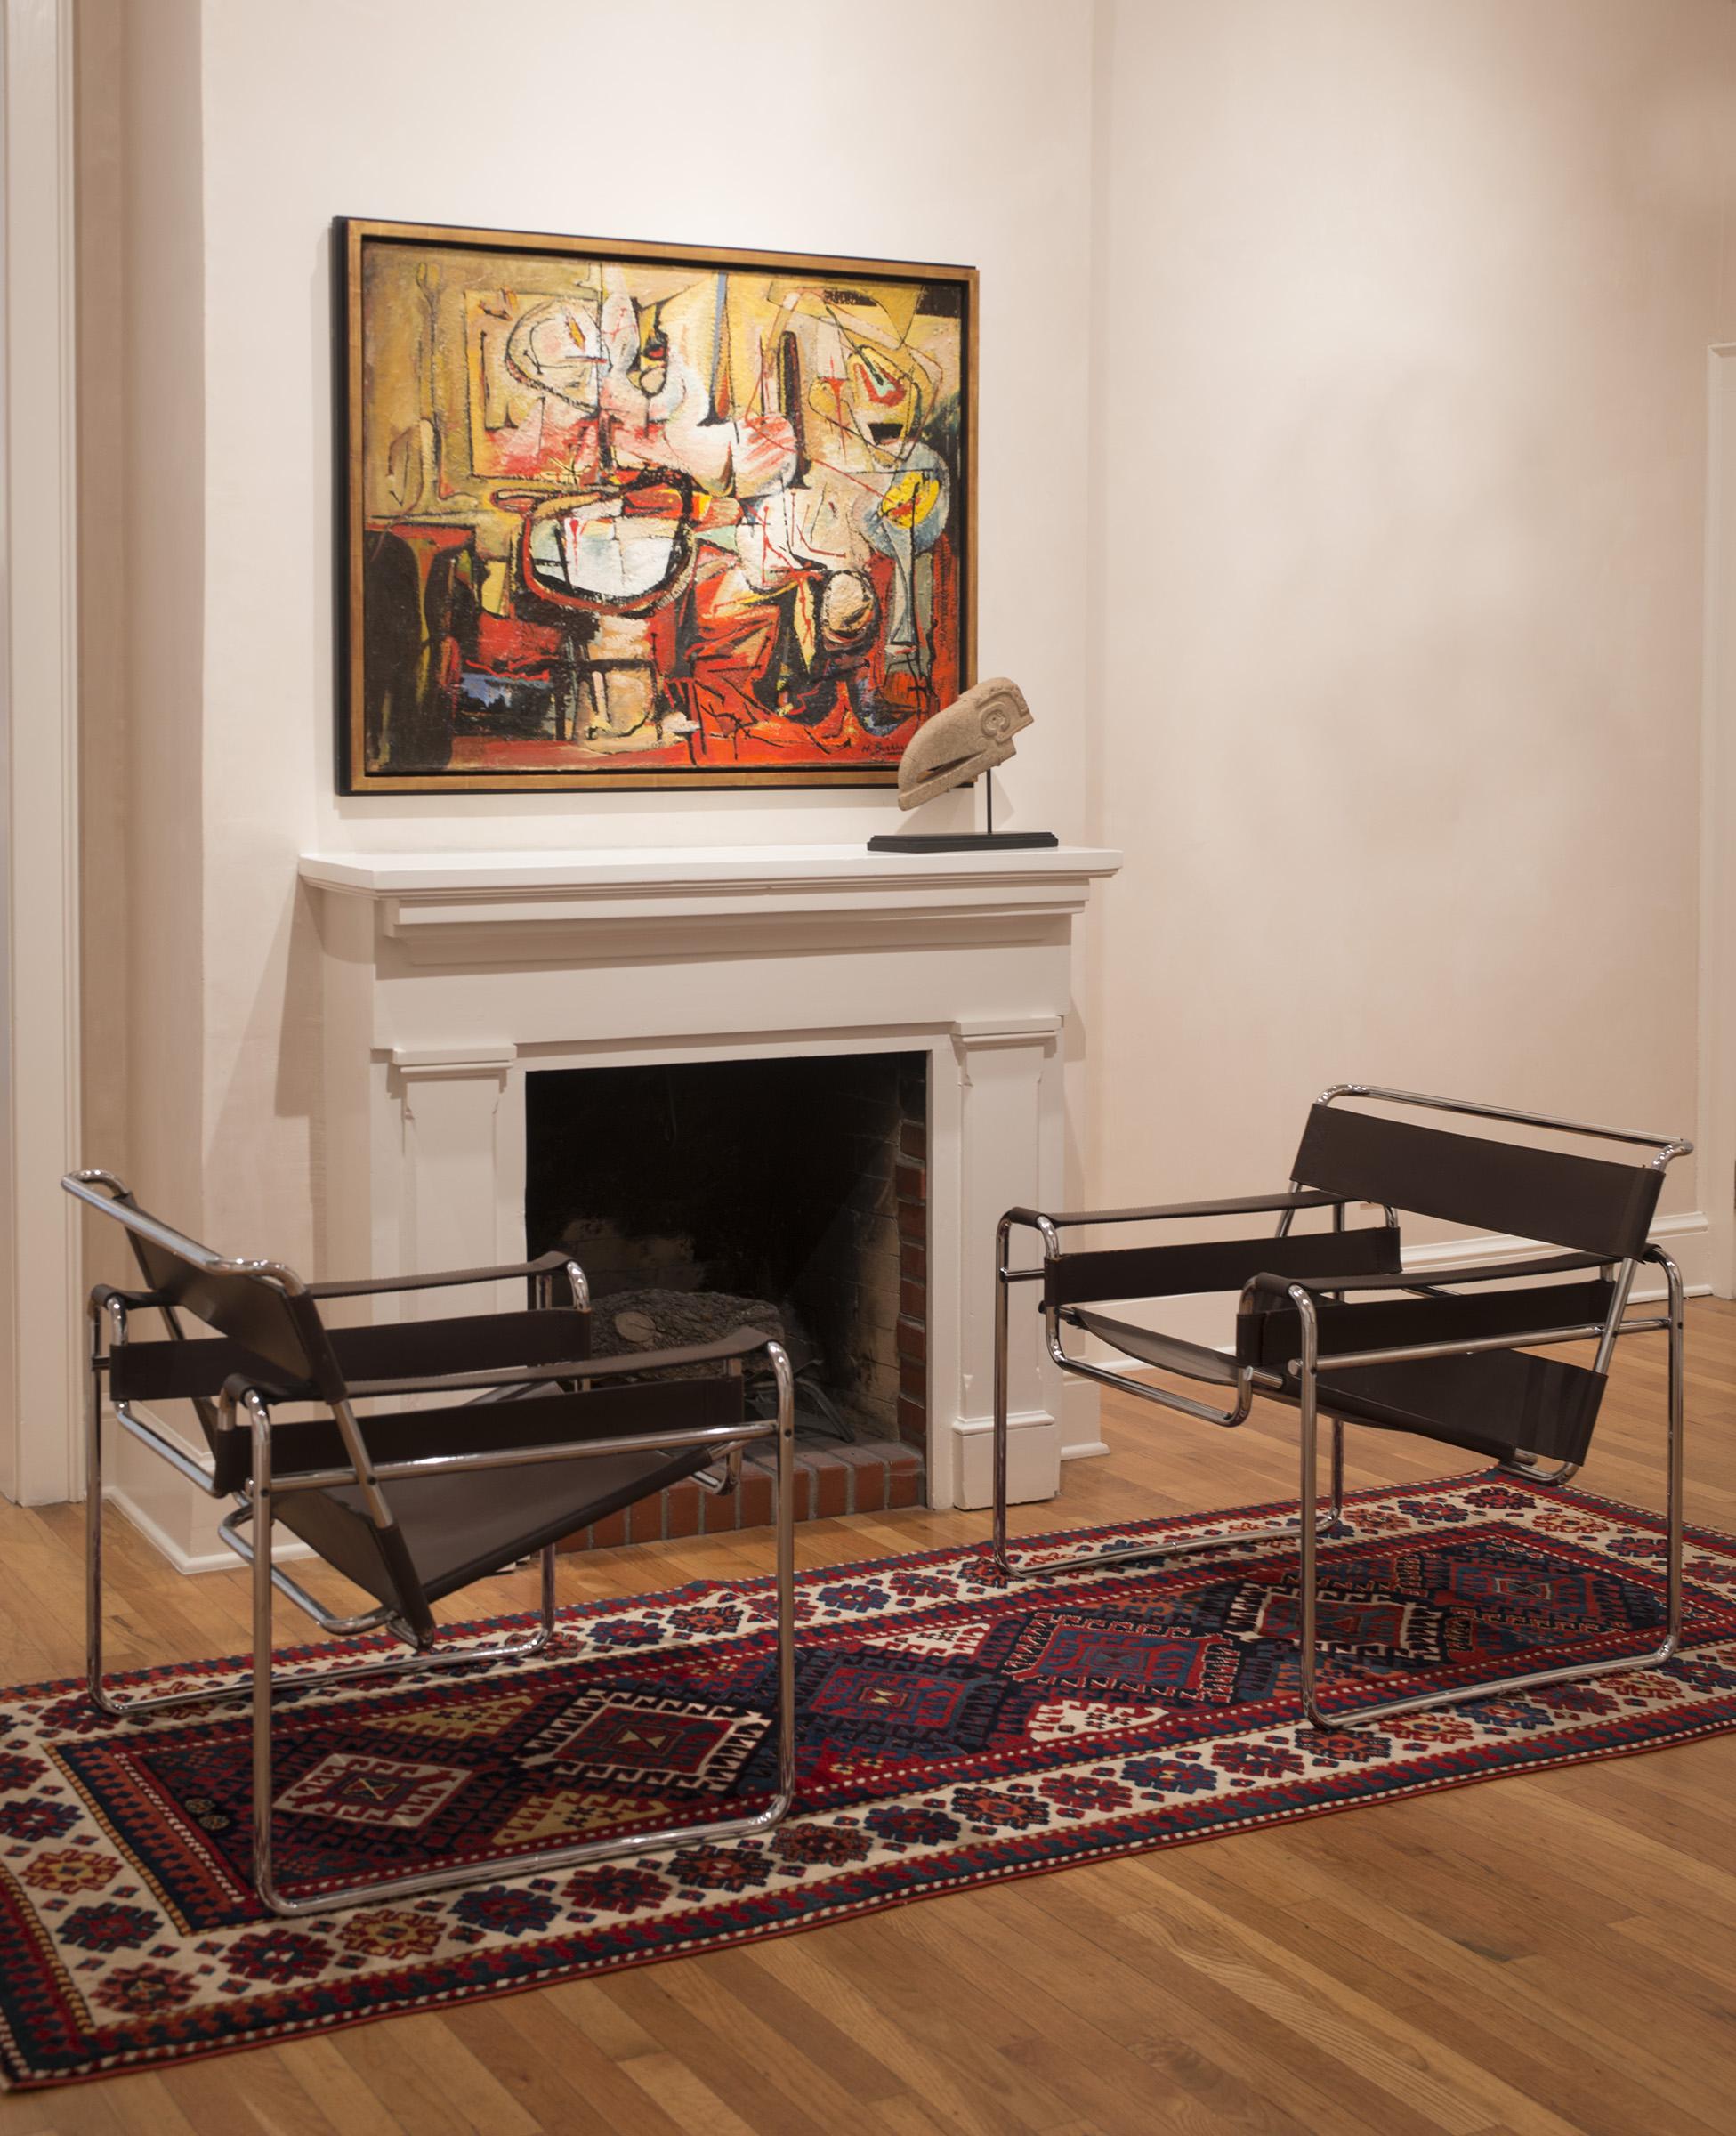 Untitled 1953 in situ at Peyton Wright Gallery, Santa Fe, NM